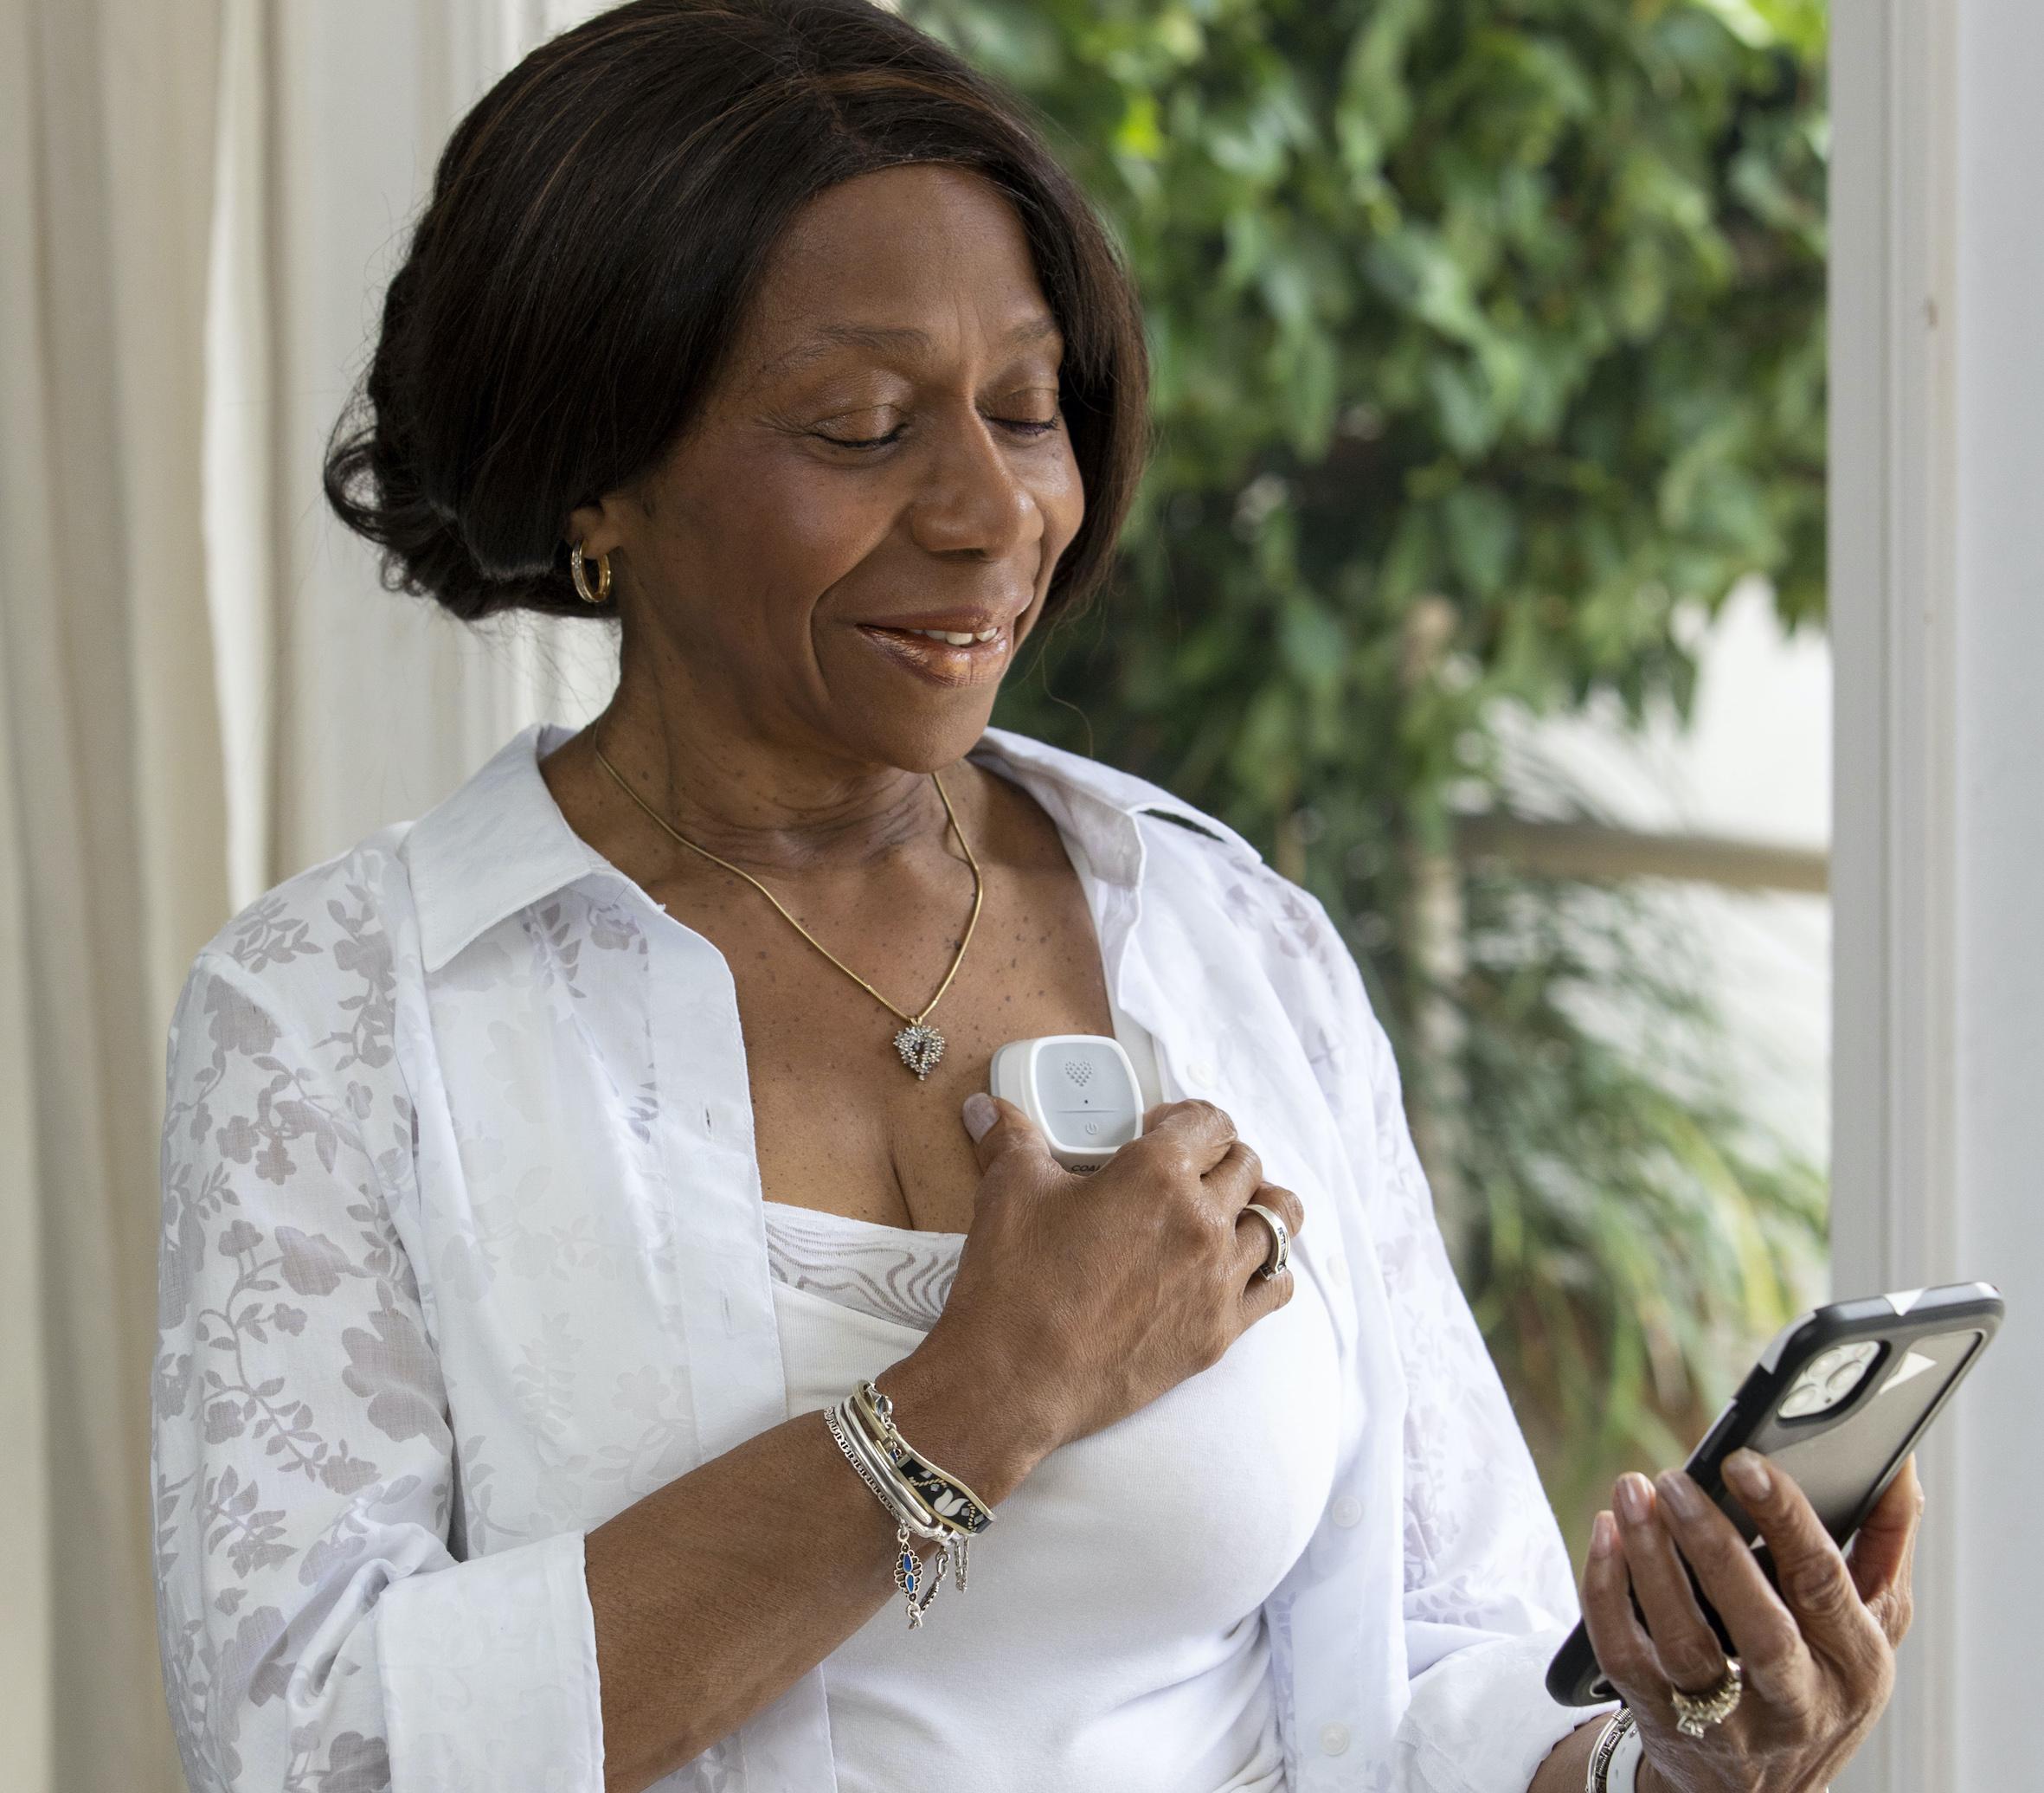 Woman using Coala Connect Rx service for measuring ECG